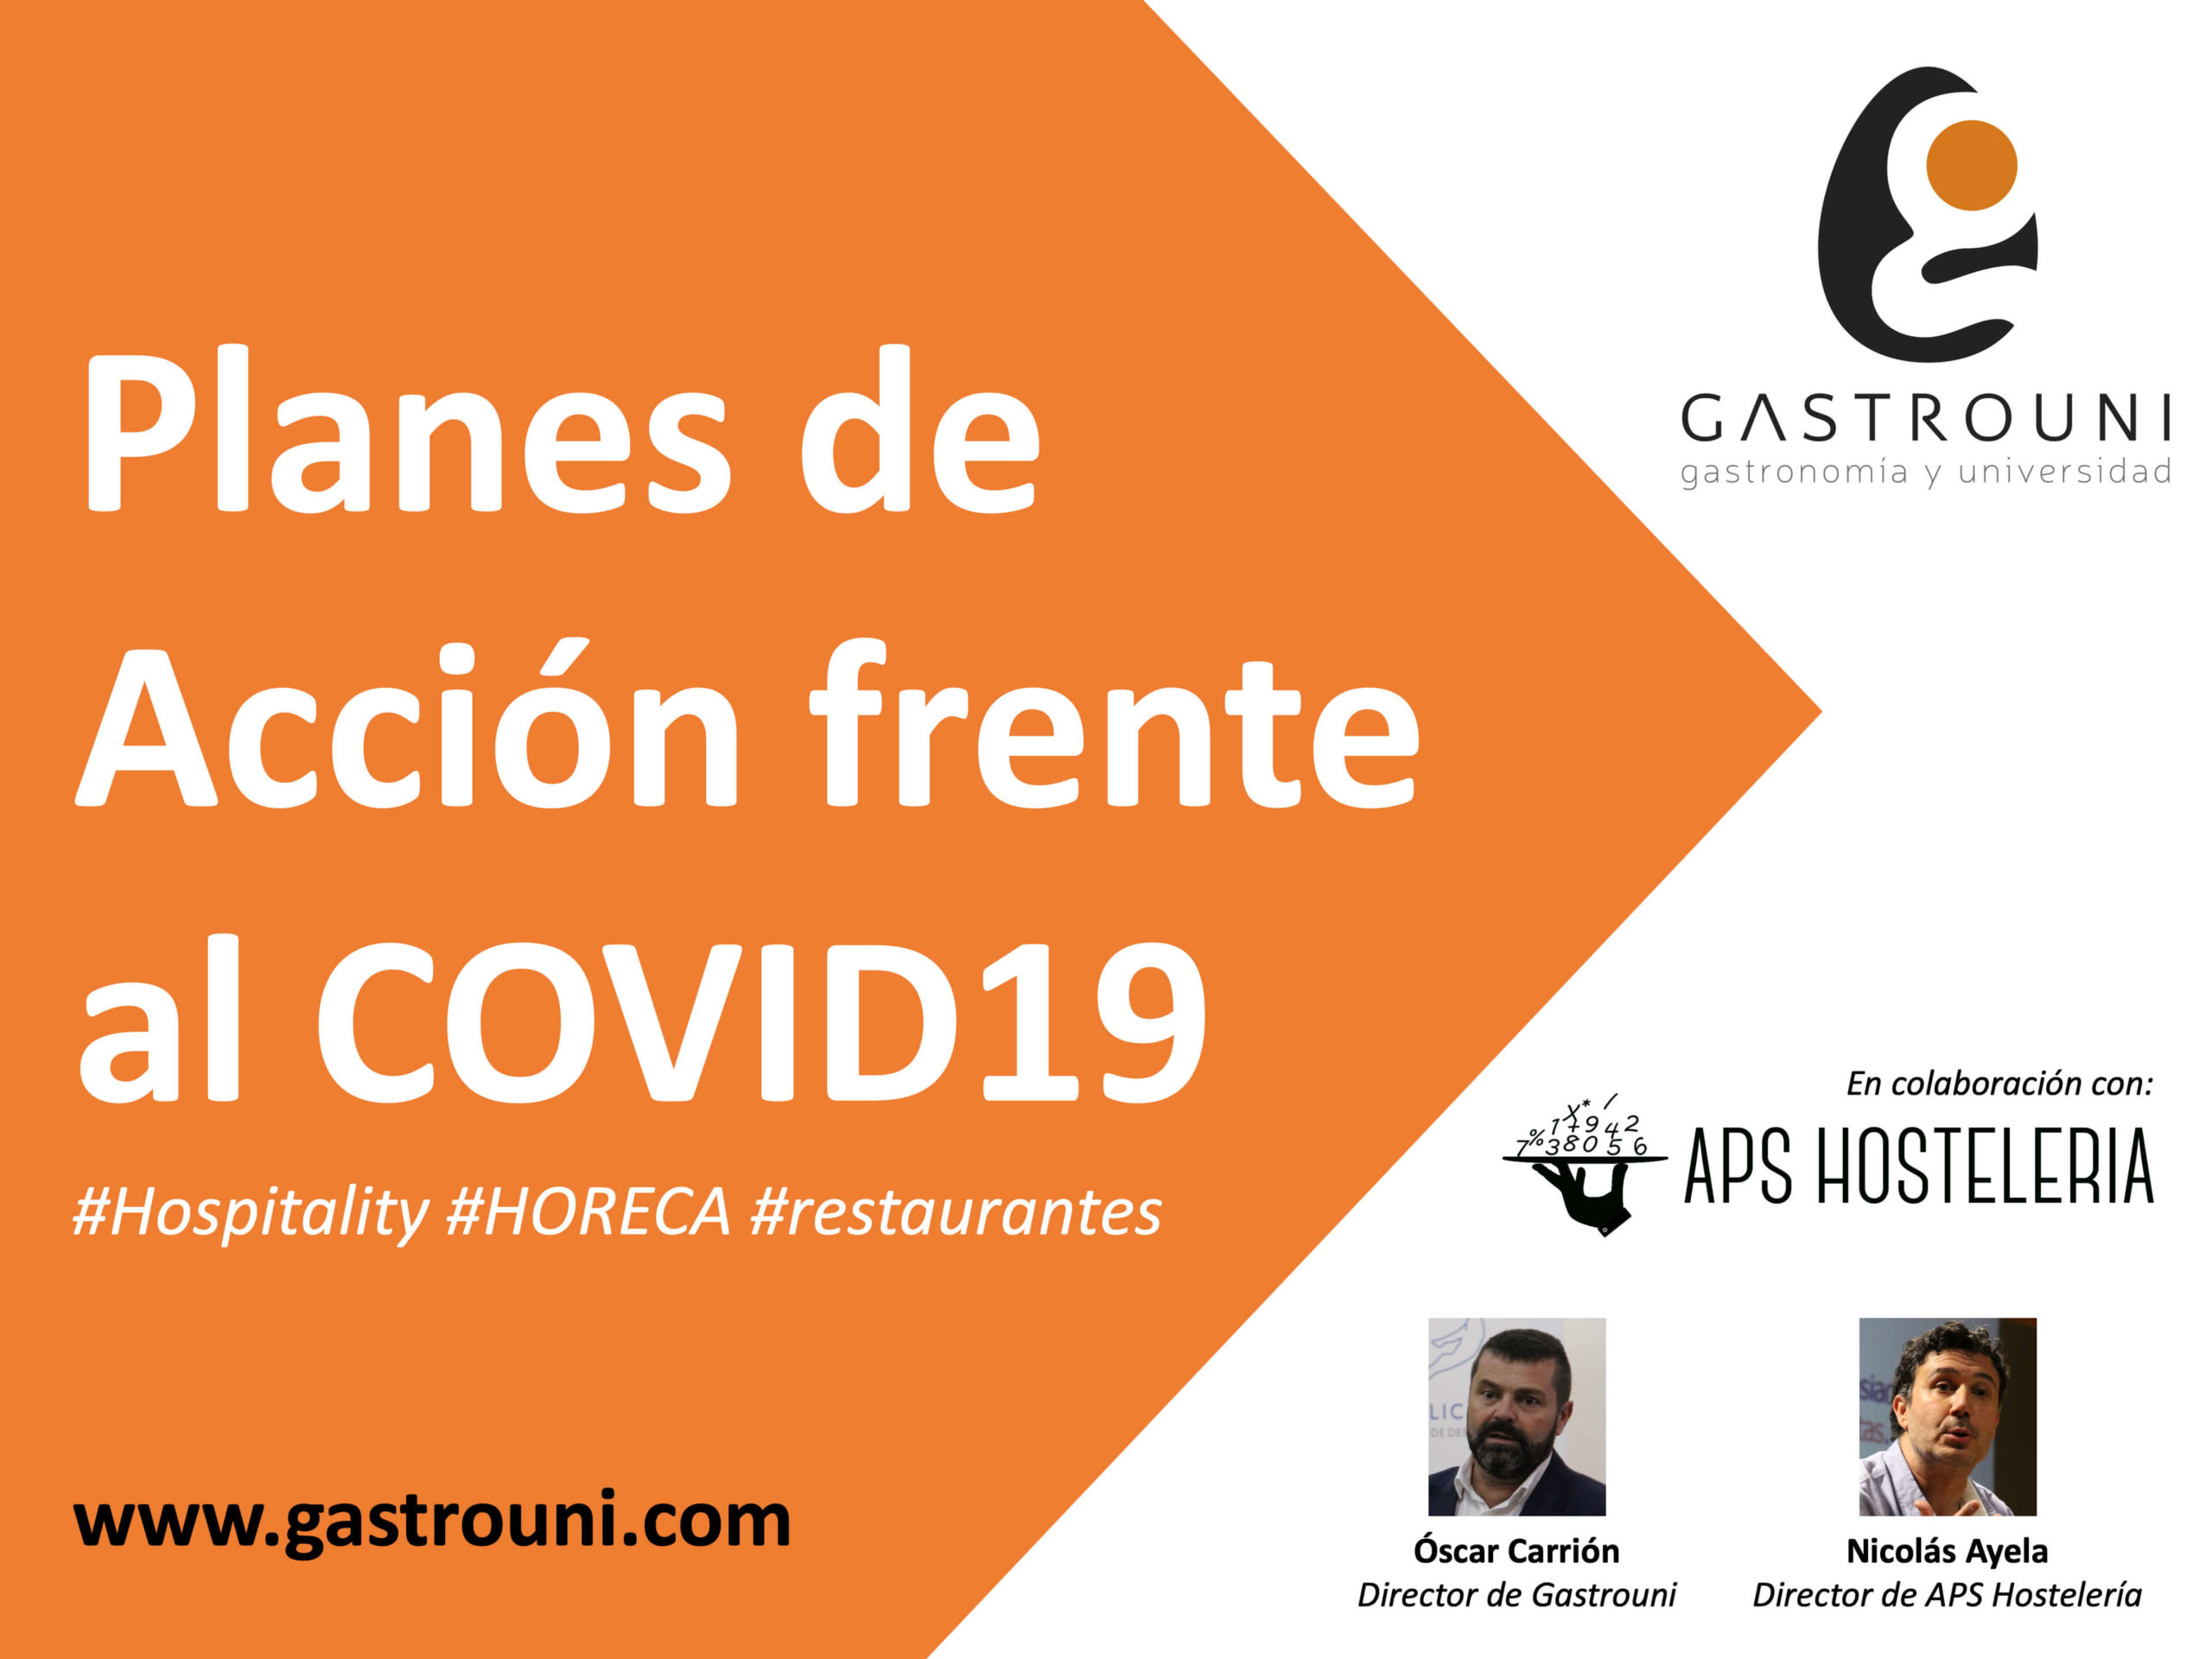 COVID19 - Gastrouni y APS Hosteleria